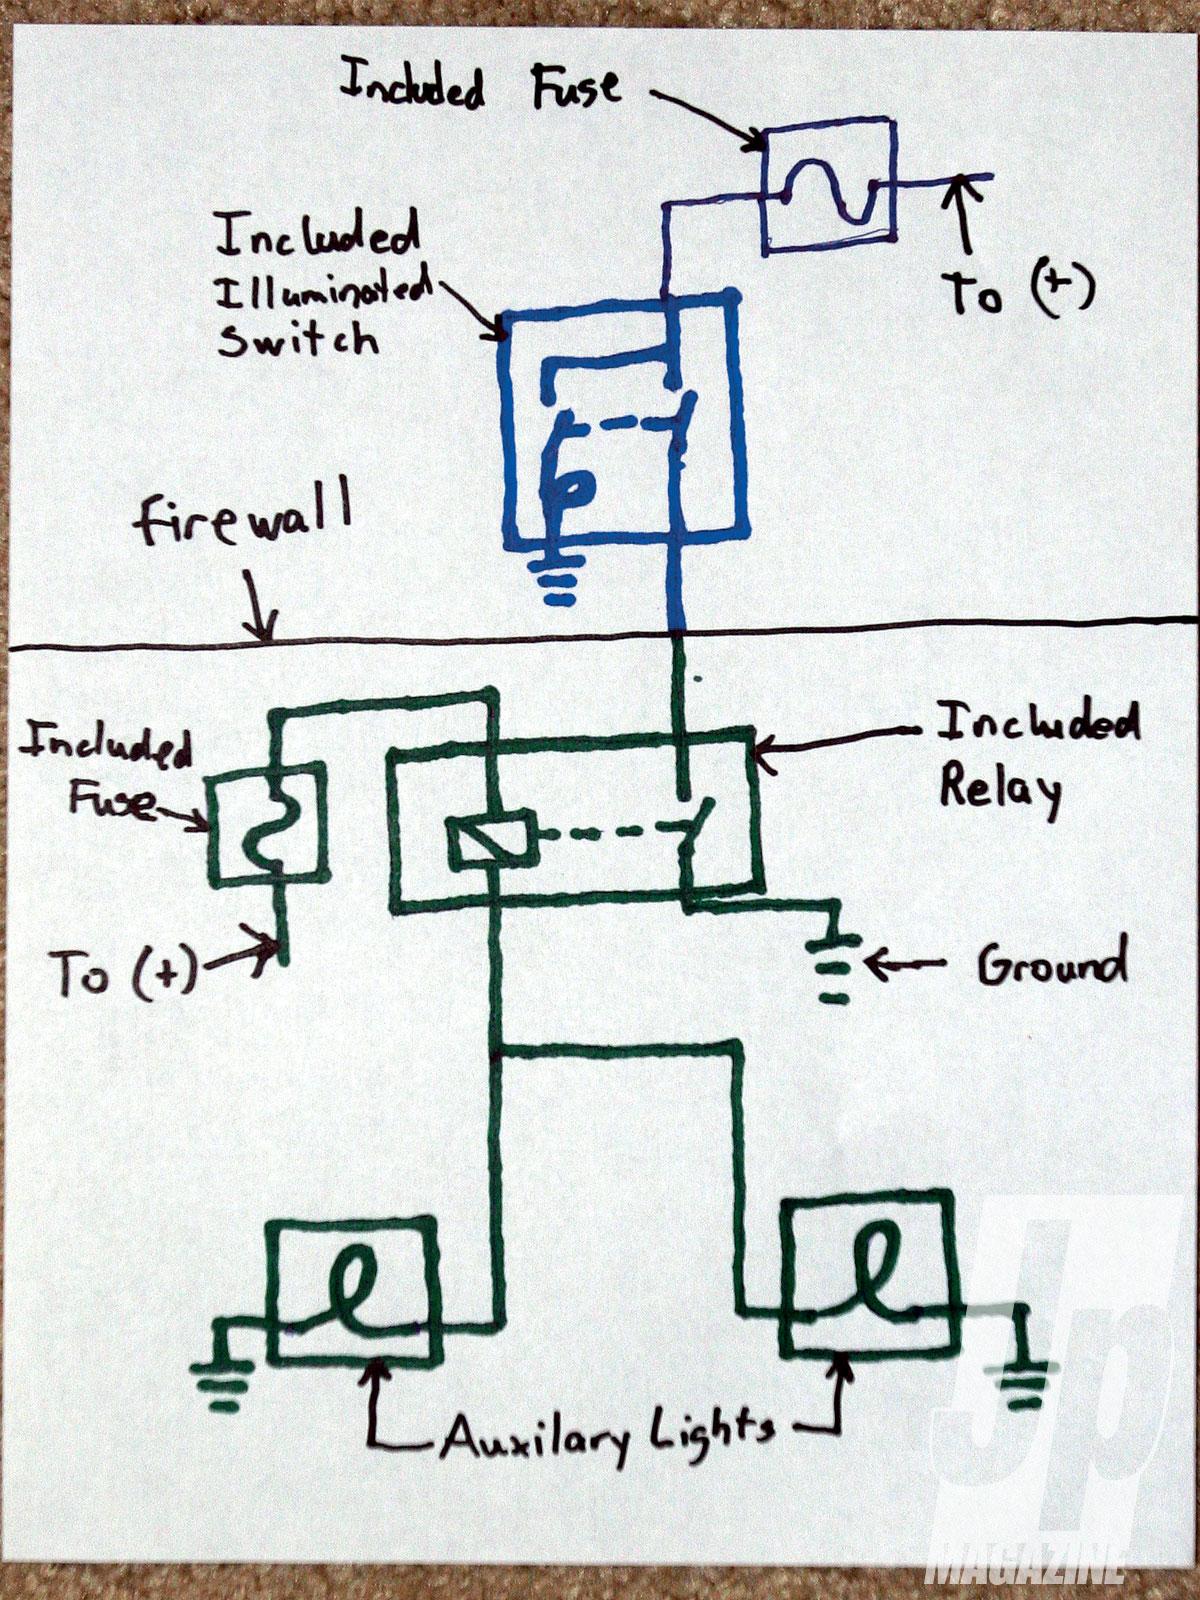 154 1011 november 2010 randys electrical corner - eagle eye wiring diagram  - photo 03